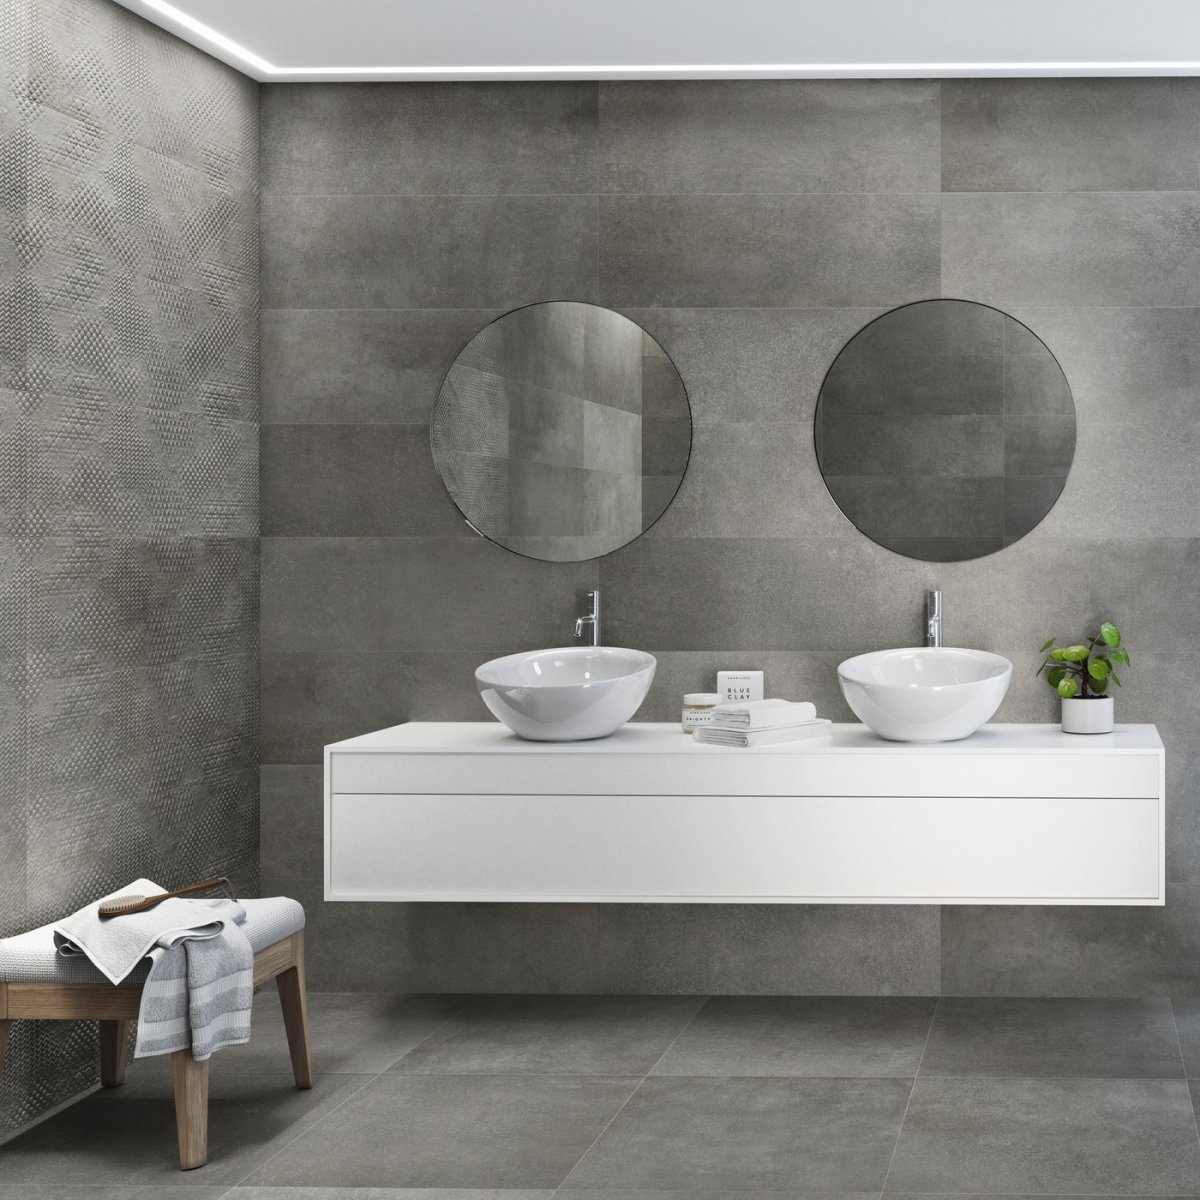 AB Betonhome Grey 600x1200mm_Stiles_Lifestyle_Image